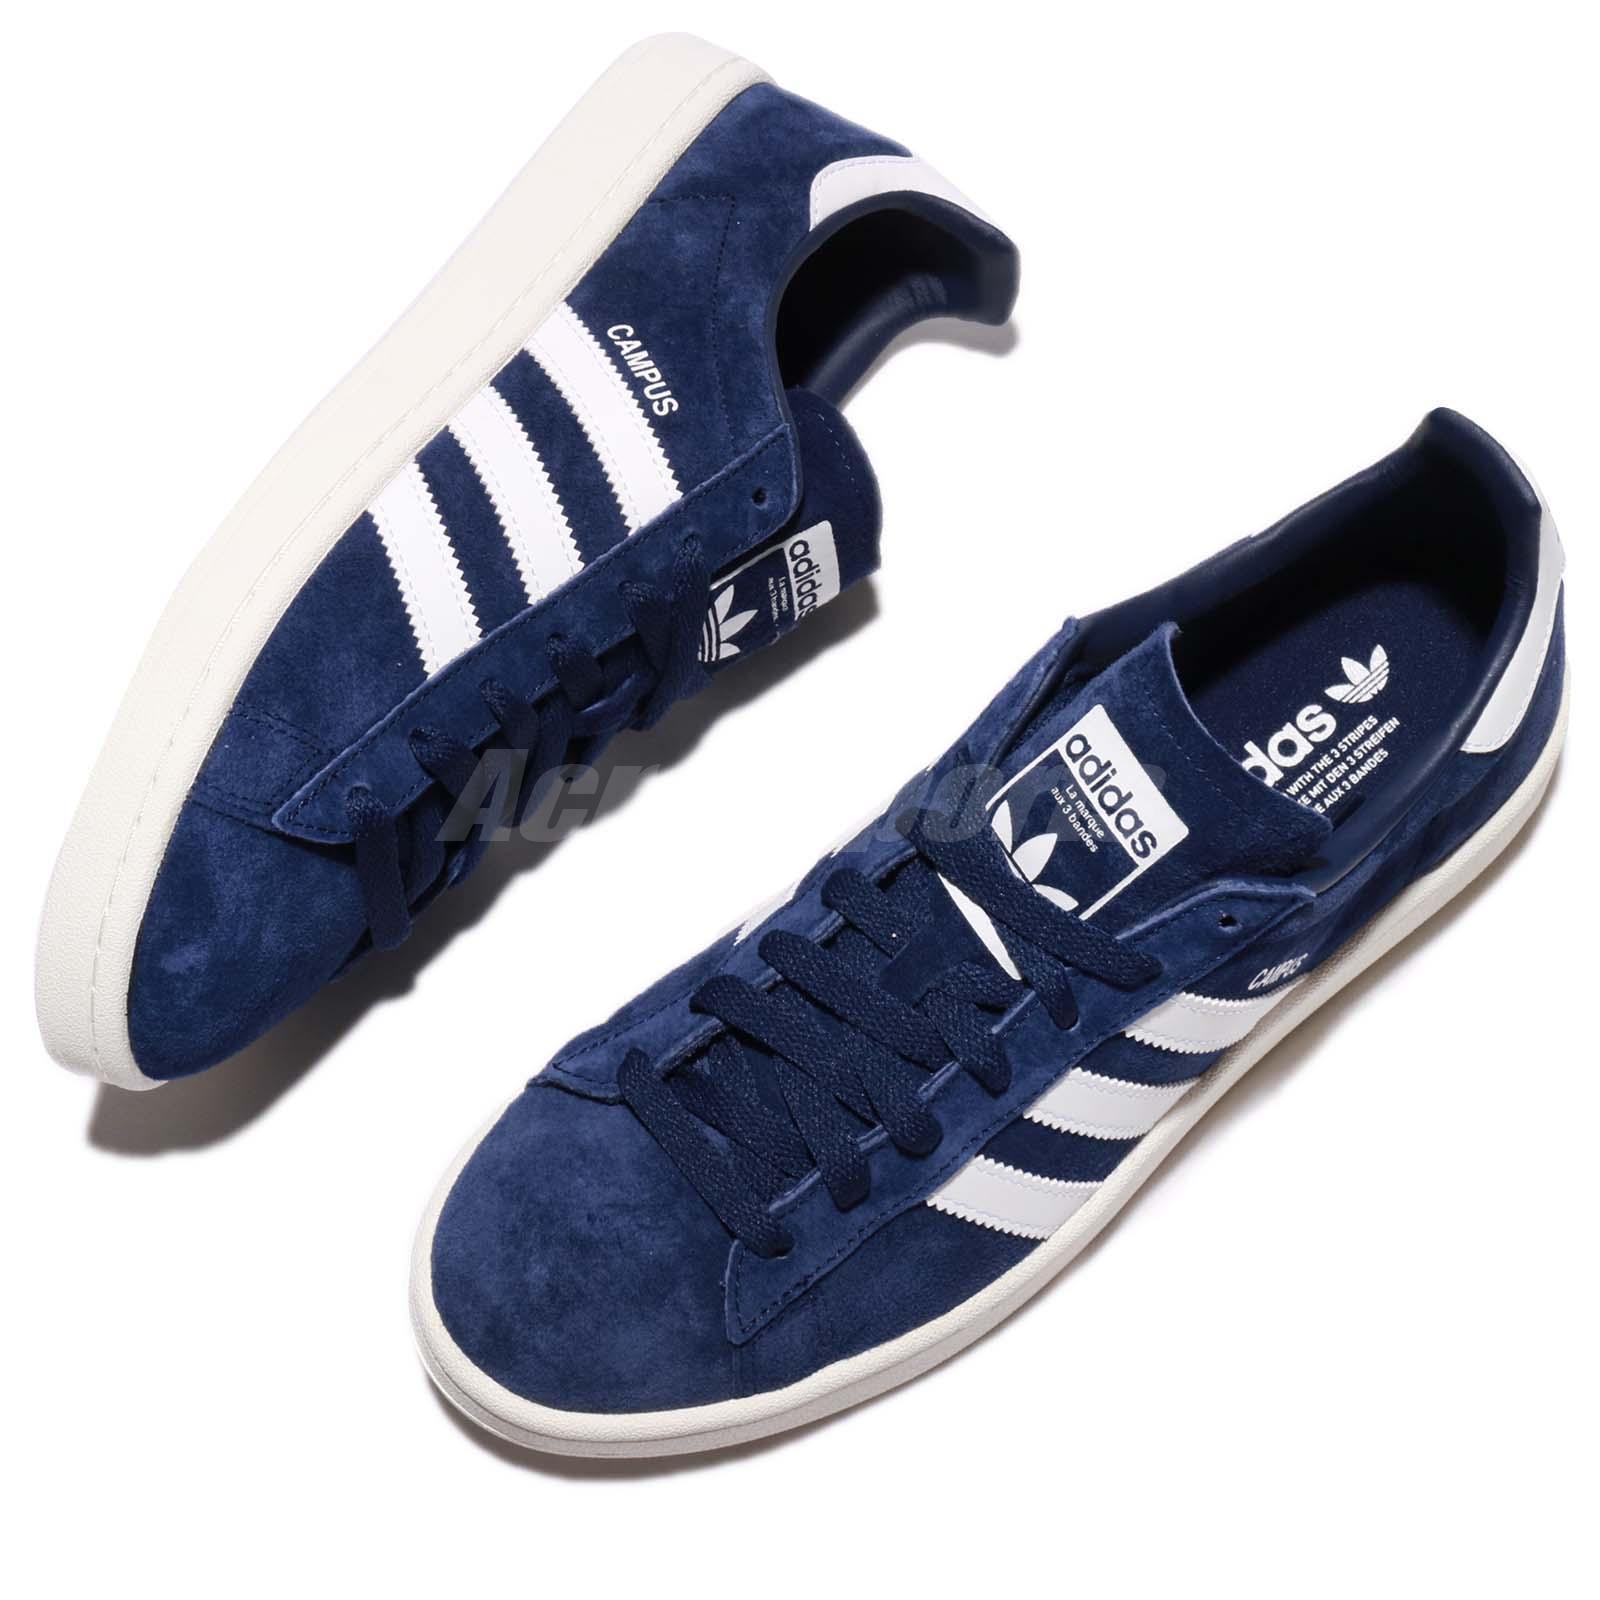 brand new 4d9c0 70262 adidas Originals Campus Suede Dark Blue White Navy Men Classic Shoes ...